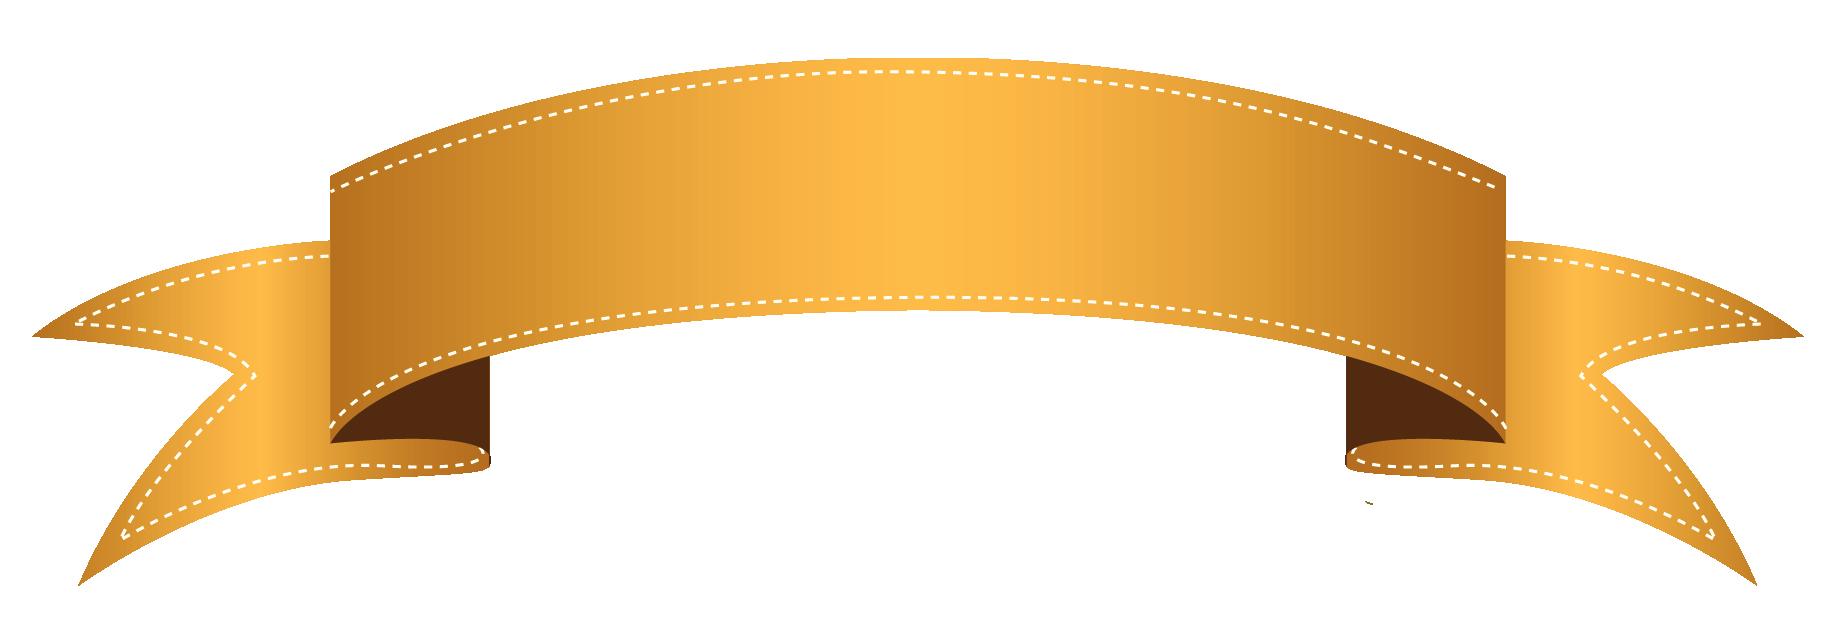 Ribbon Banner Template Best Of Png Pesquisa Google Vetores Coreldraw